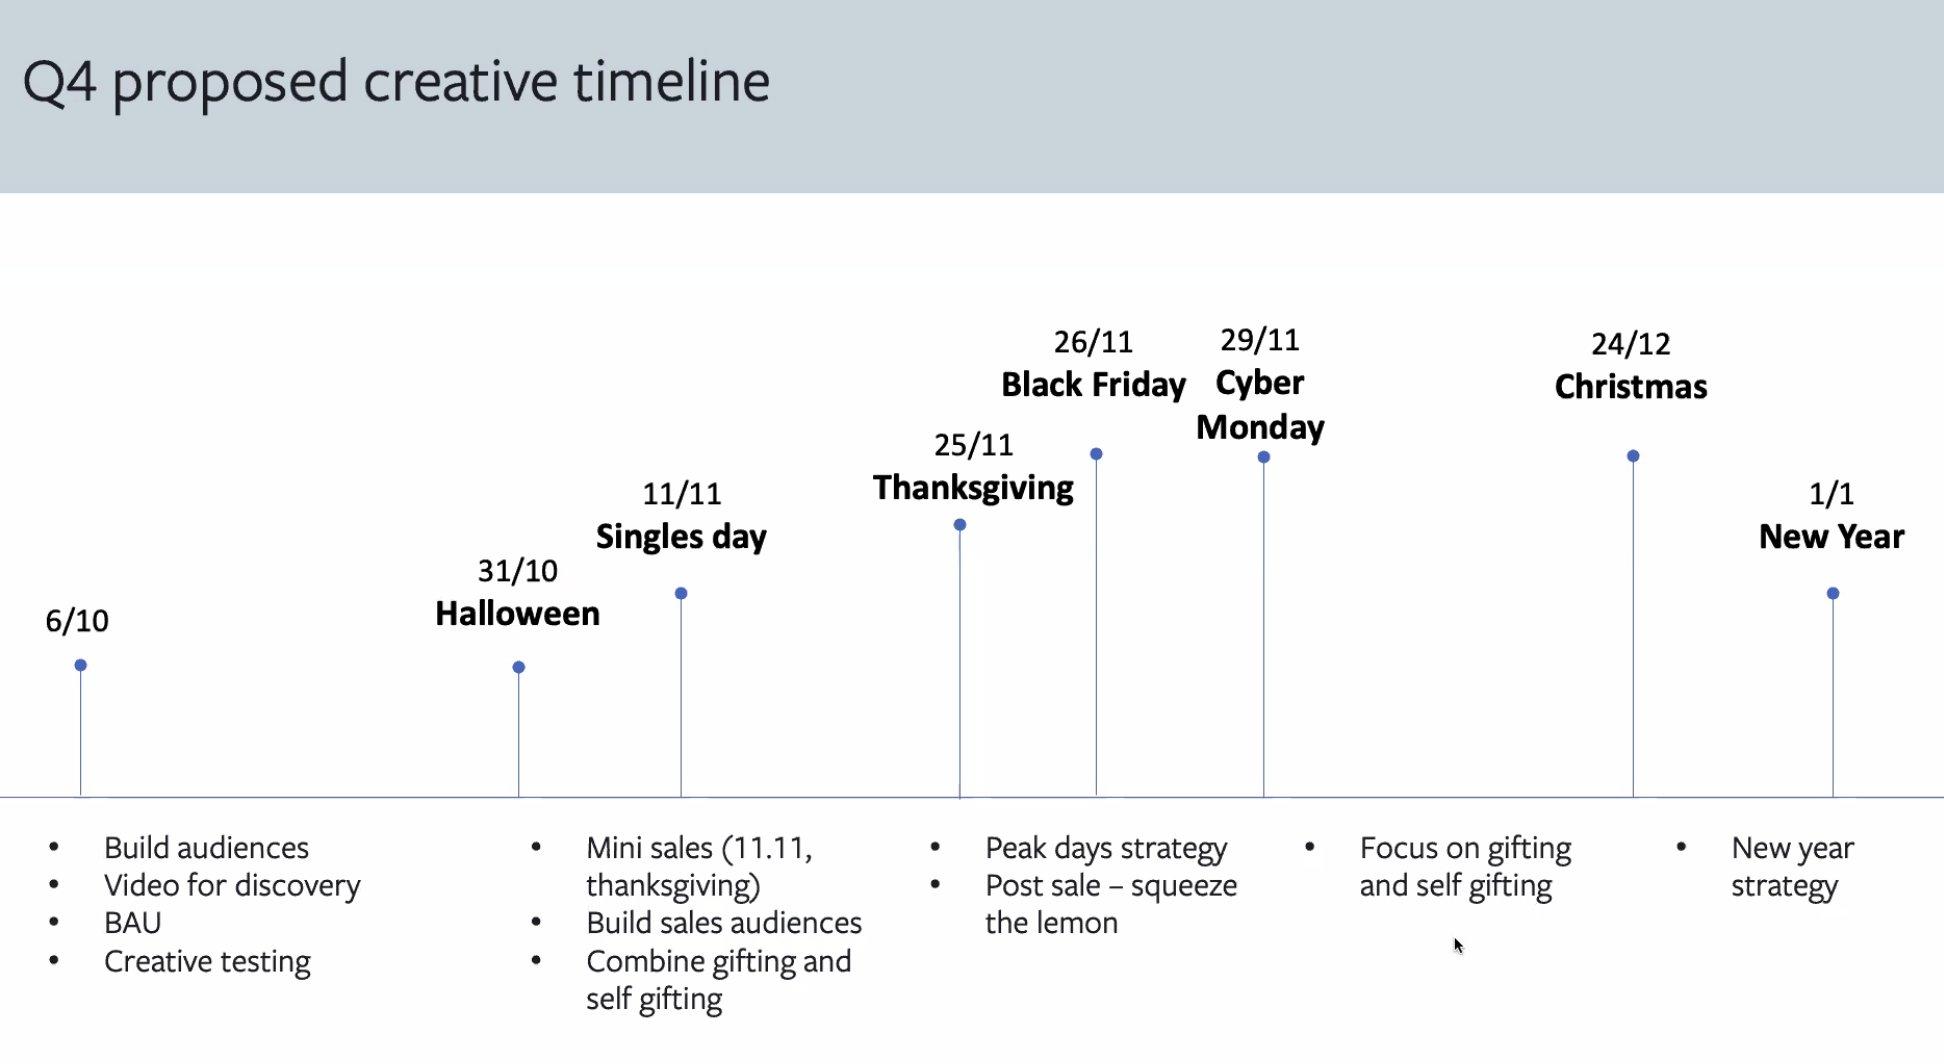 Facebook Q4 proposed creative timeline